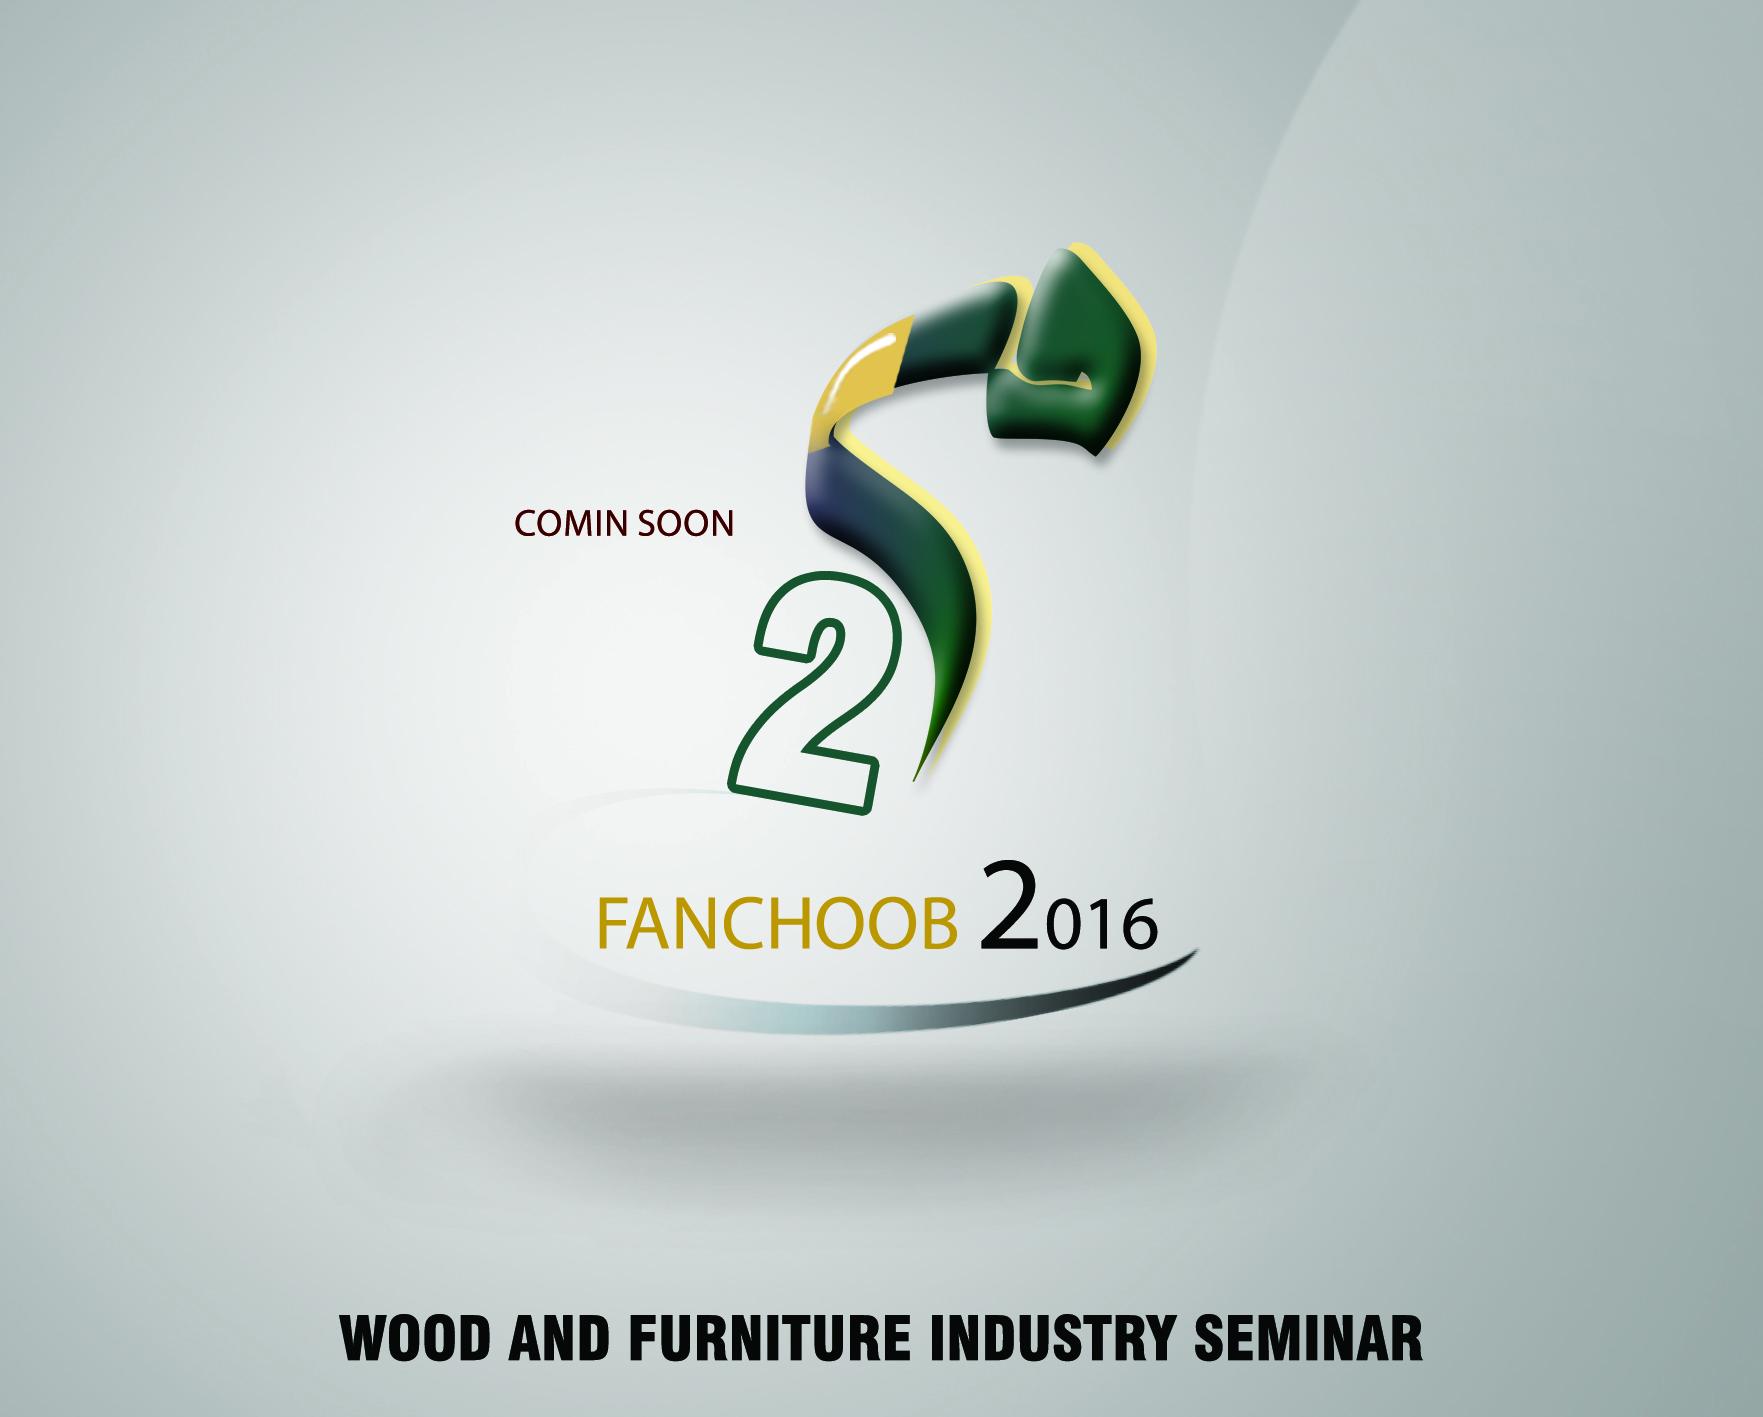 طراحی لوگو فن چوب 2